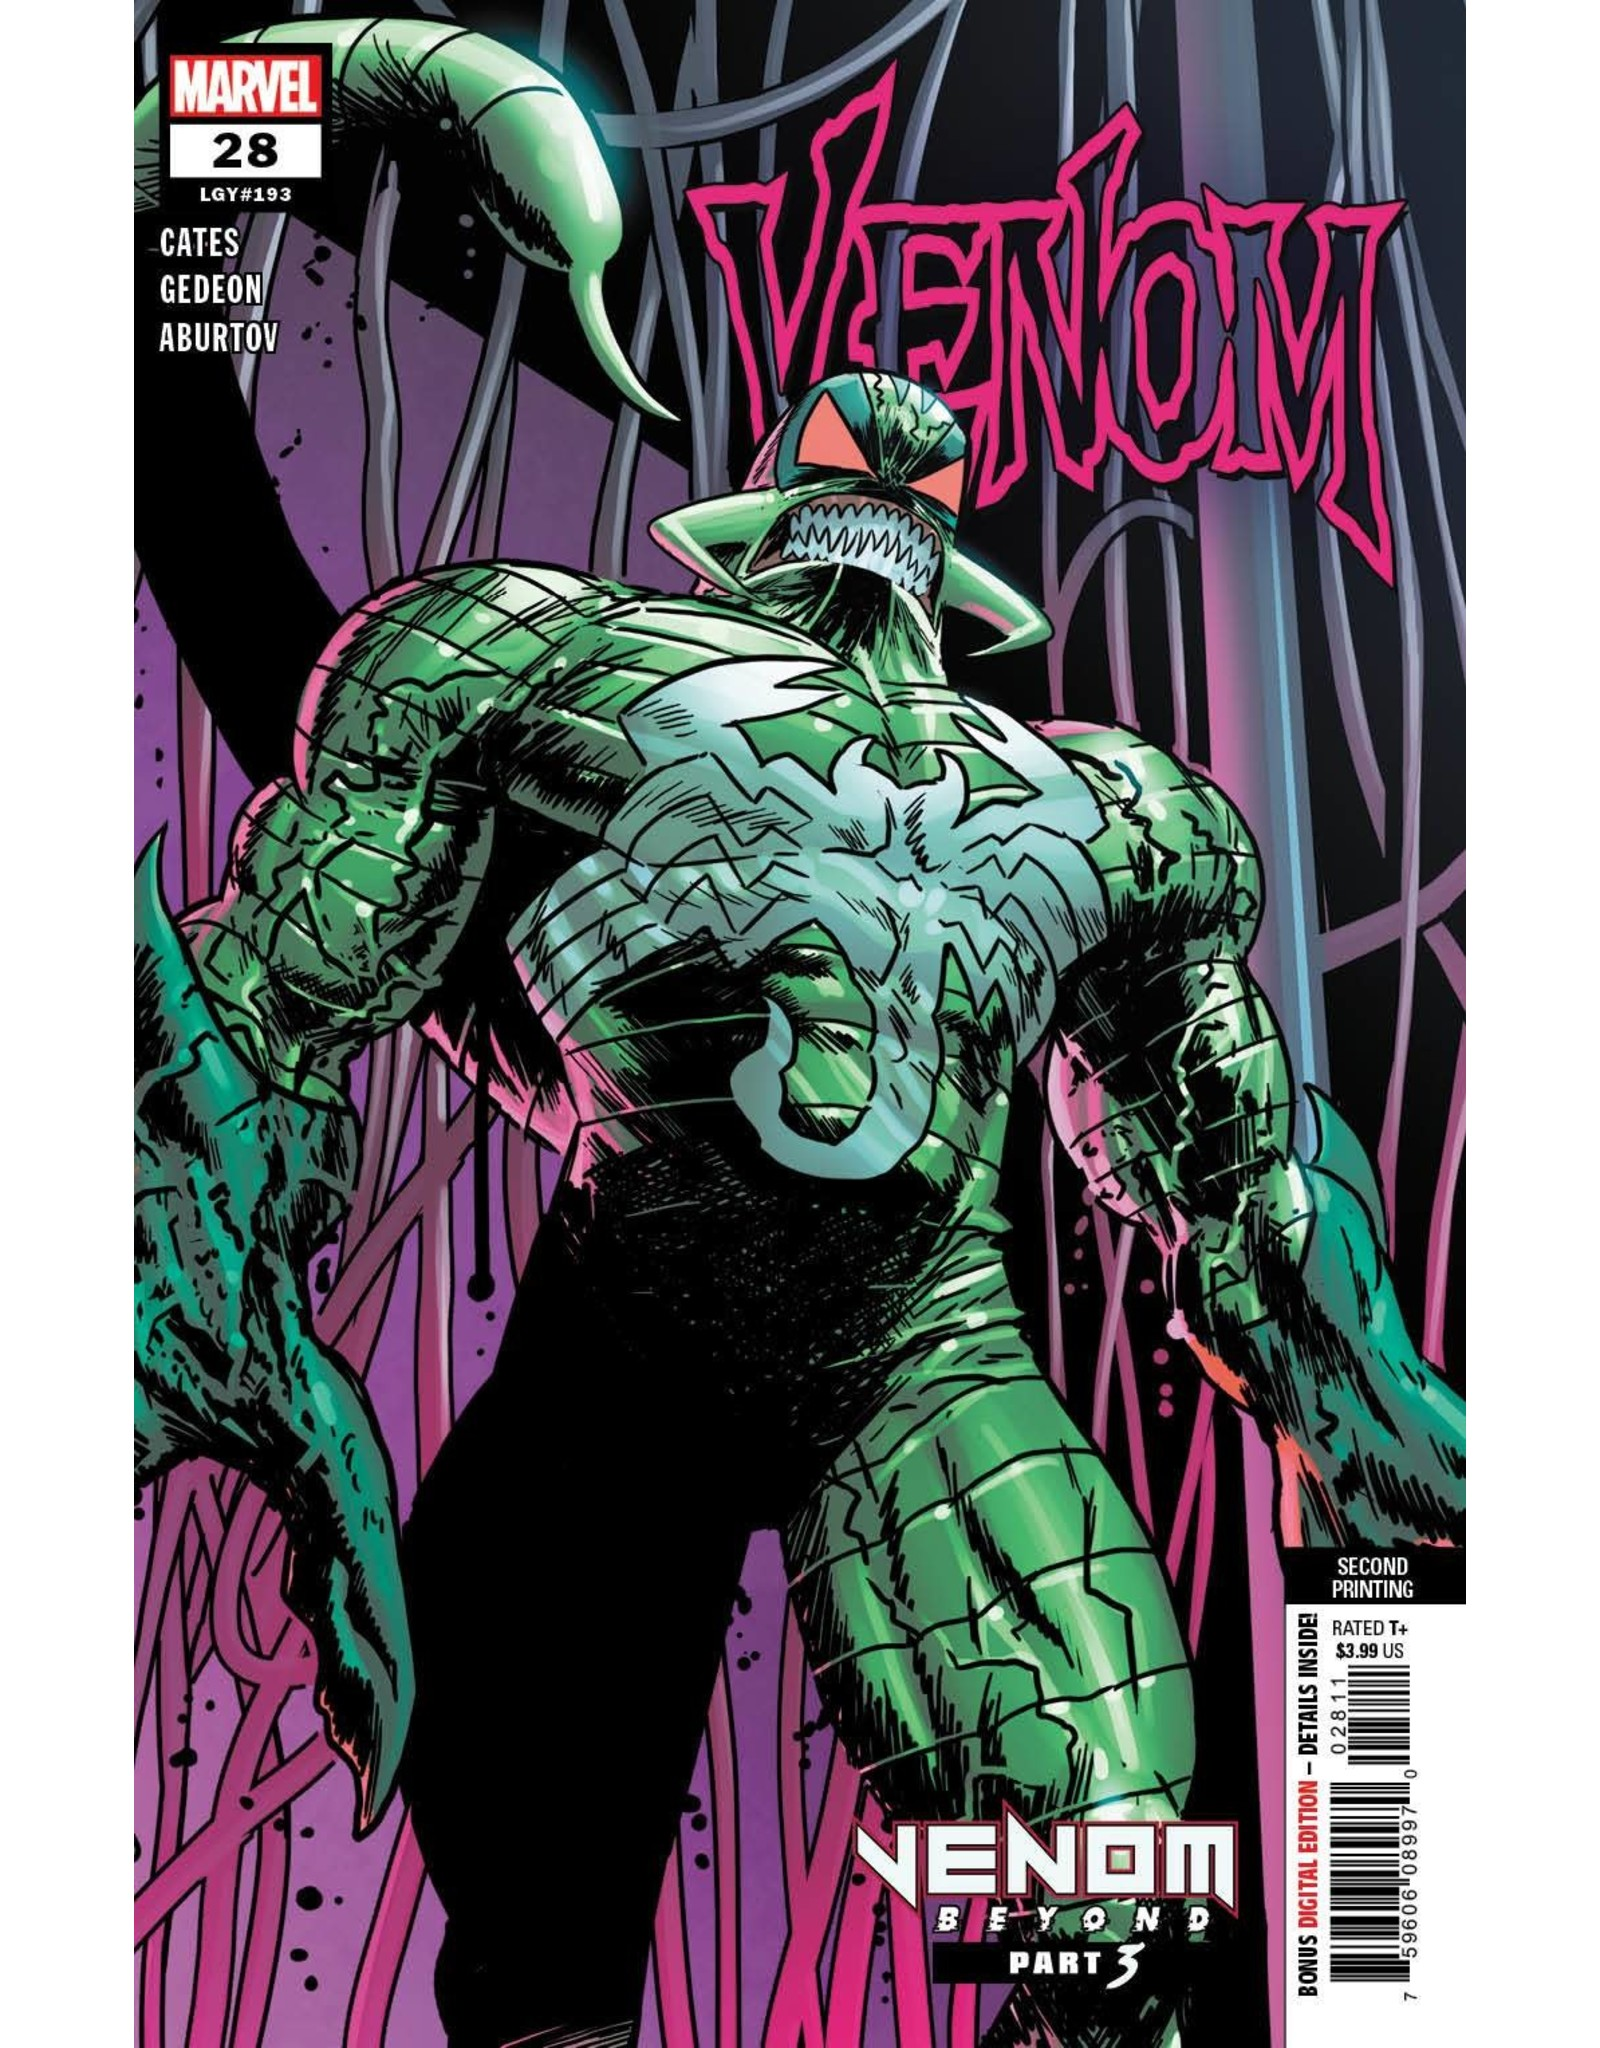 Marvel Comics VENOM #28 2ND PTG GEDEON VAR